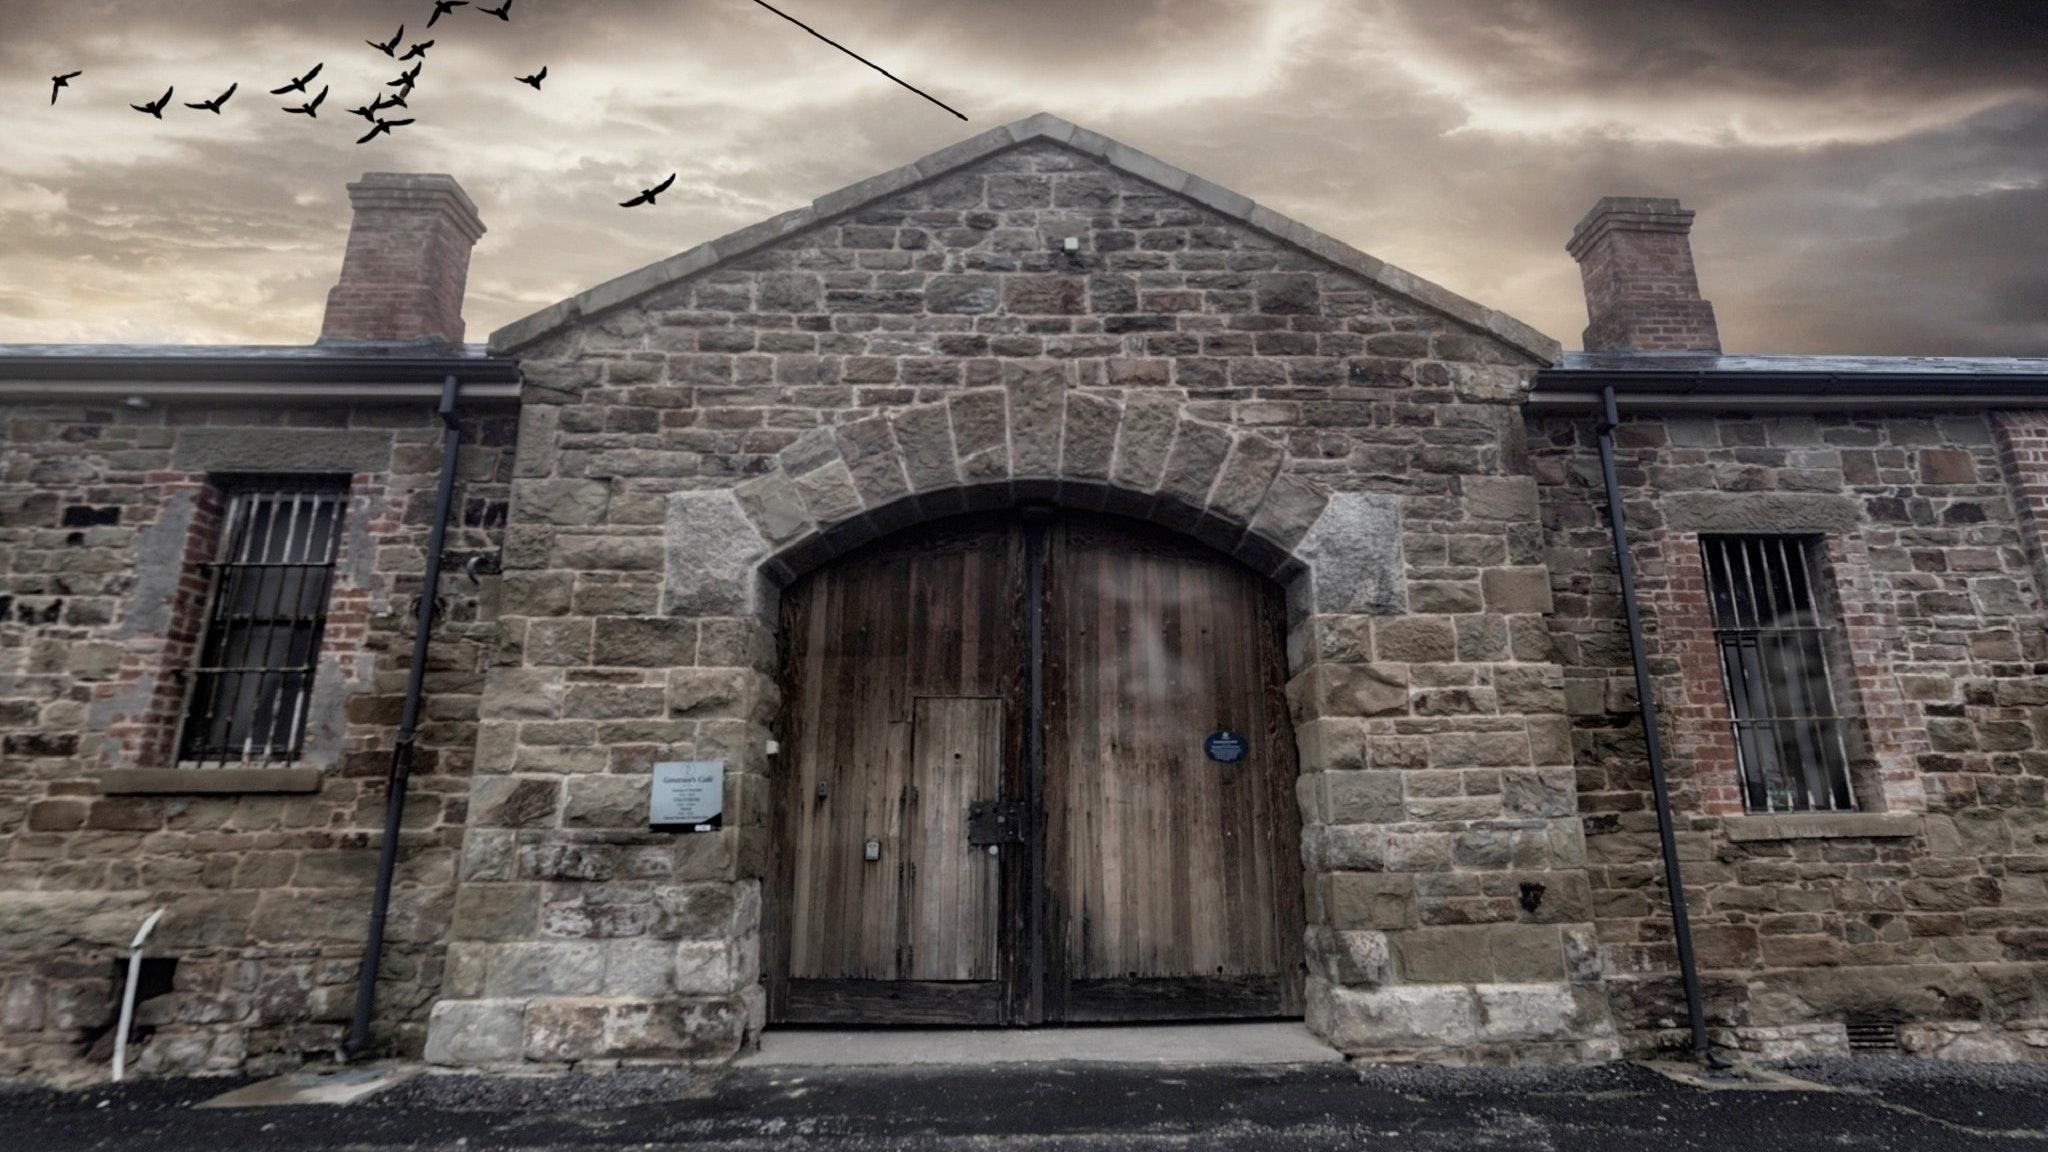 Castlemaine Gaol